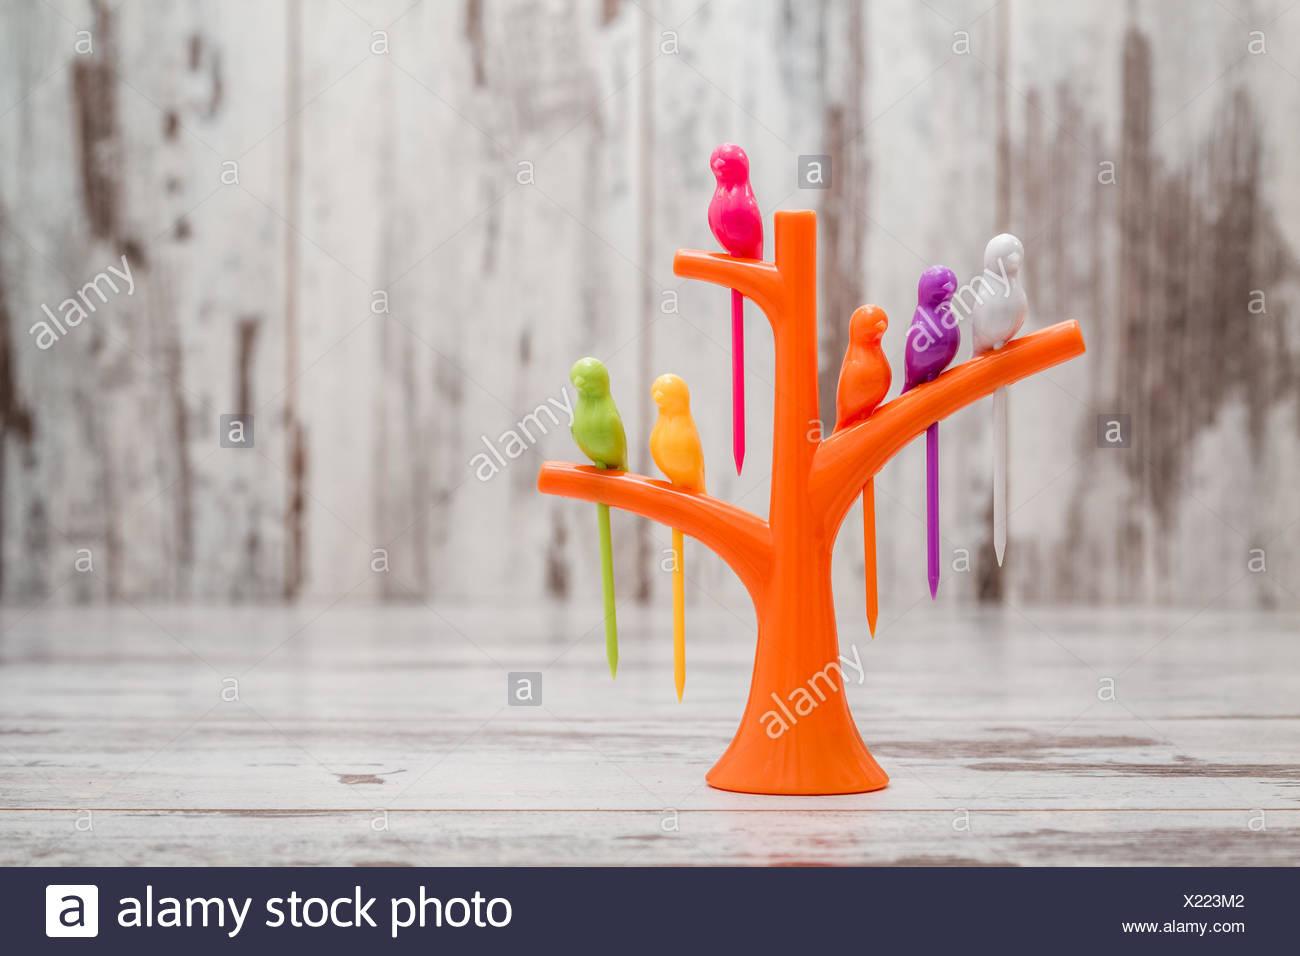 Plastic Toothpicks Stockfotos & Plastic Toothpicks Bilder - Alamy